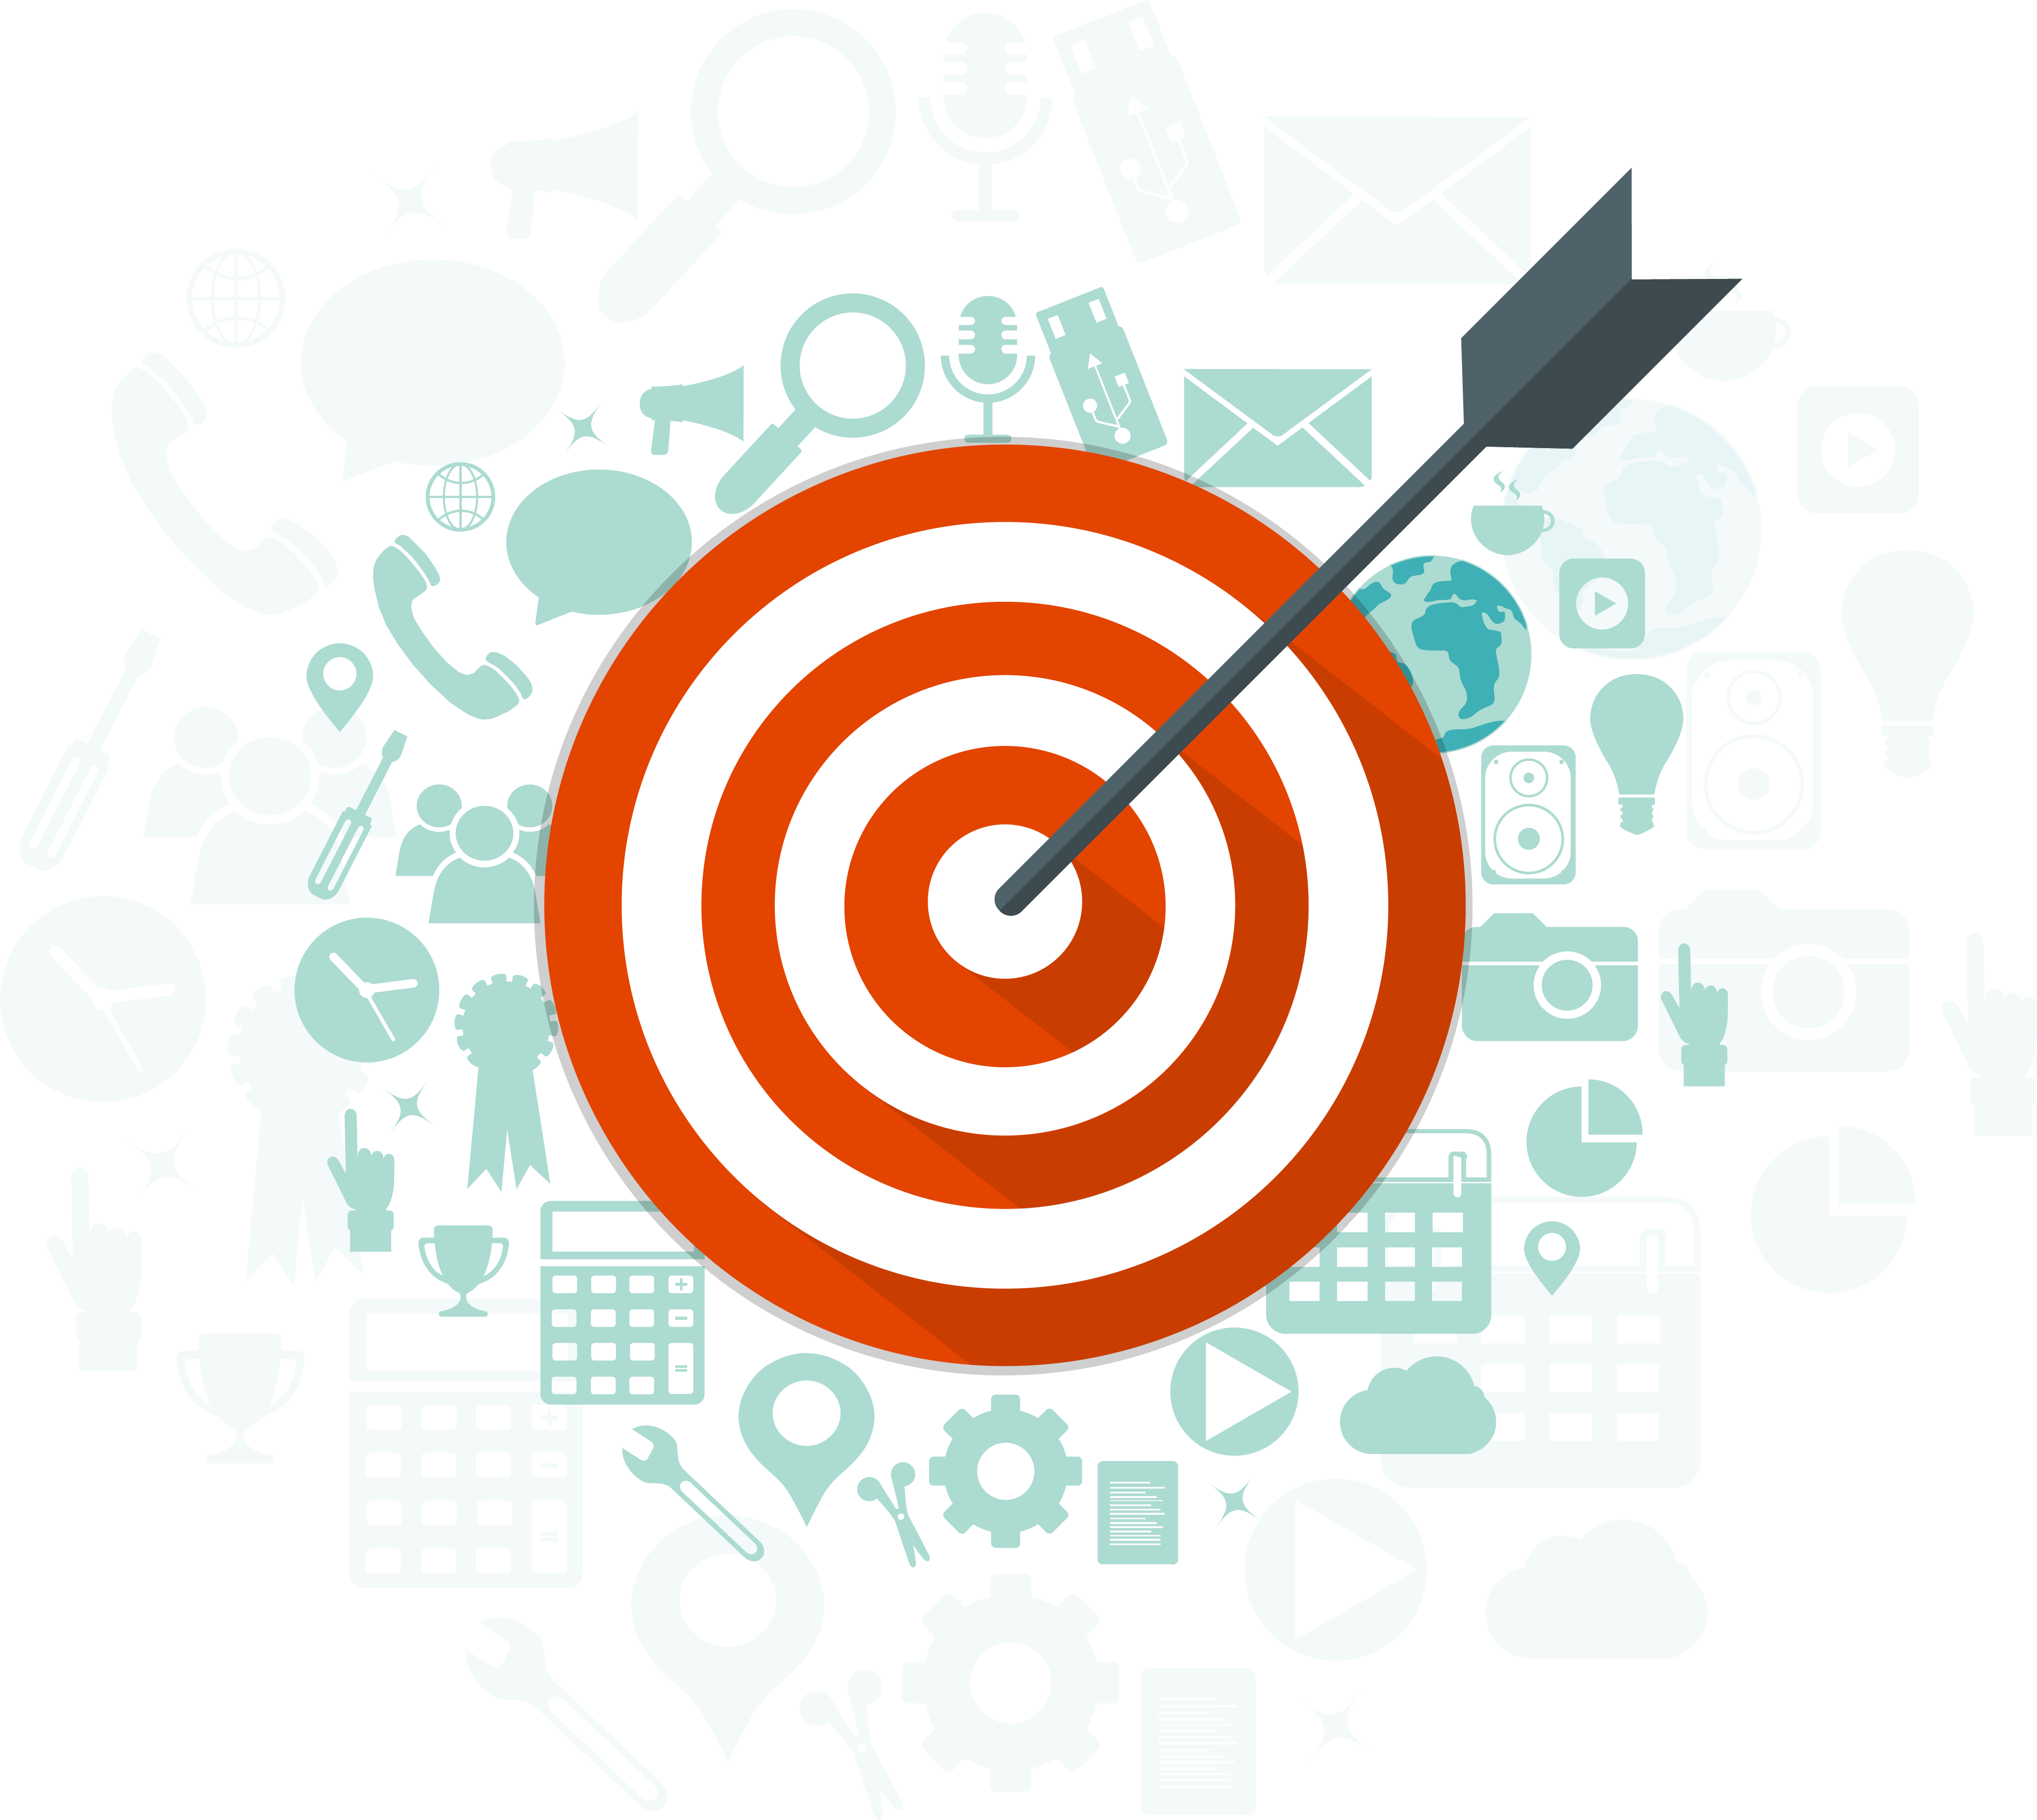 Goals clipart personal goal. Setting platform to help